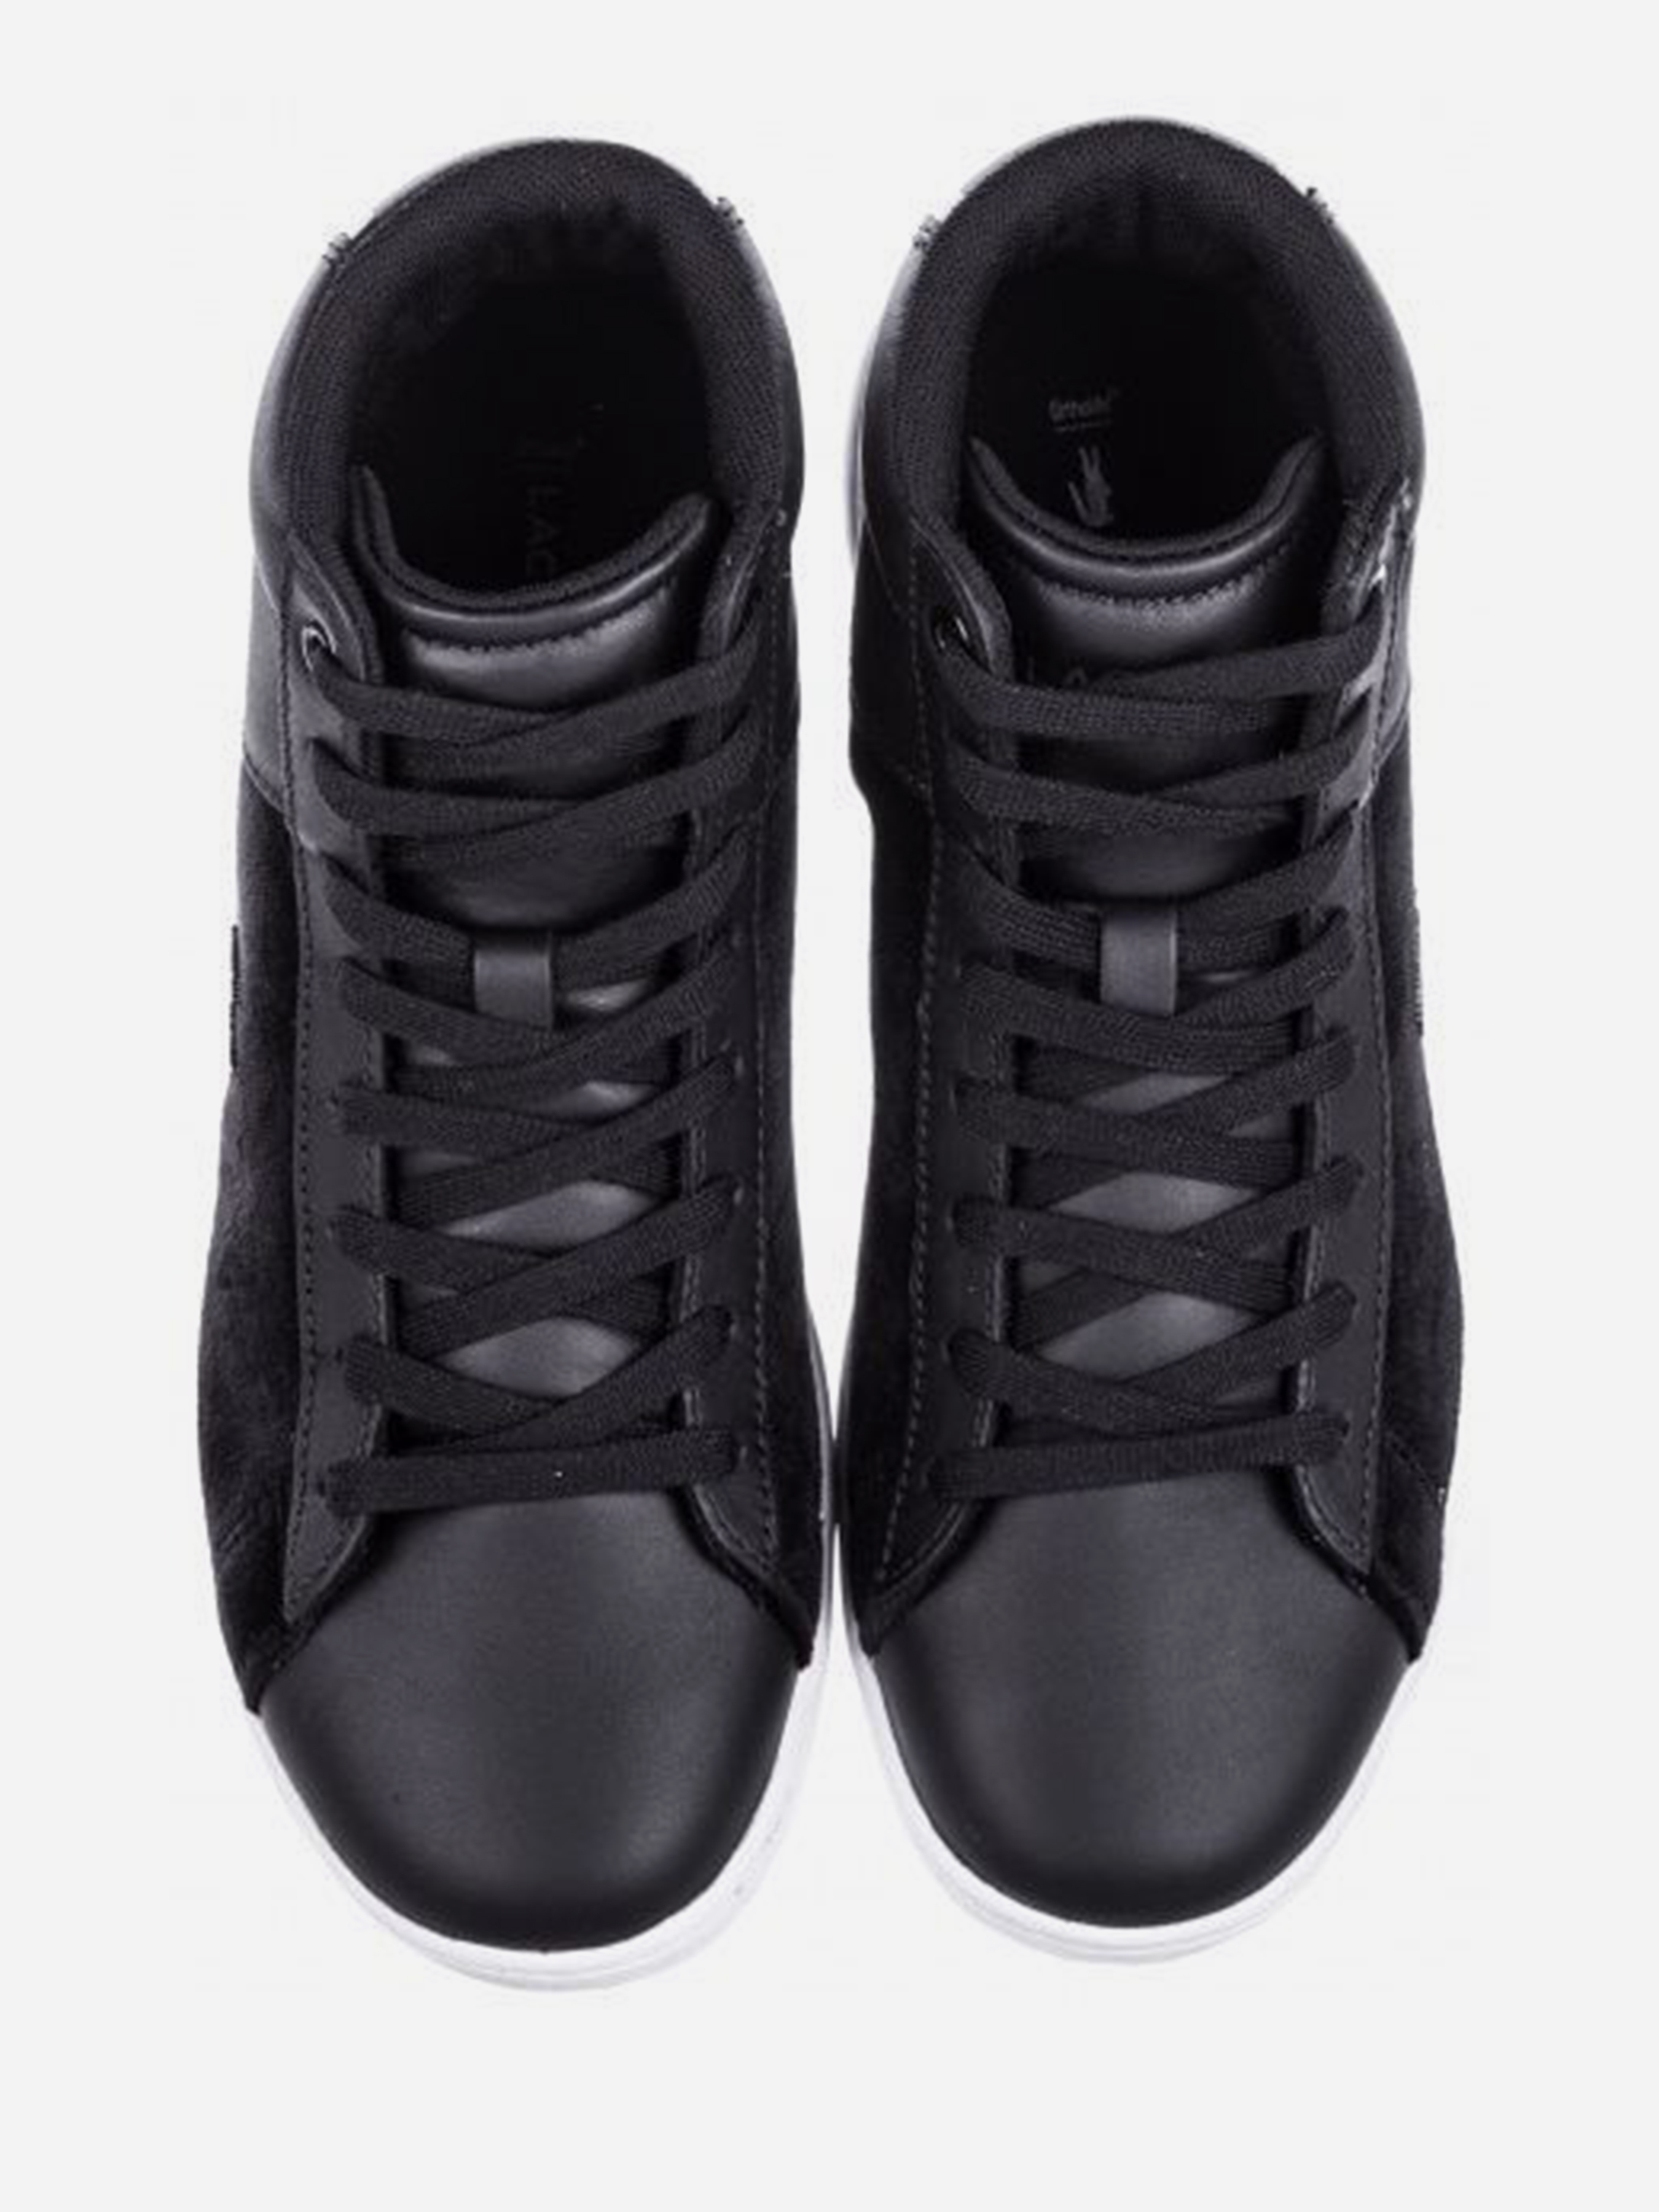 Ботинки для женщин Lacoste CARNABY EVO LL169 купить в Интертоп, 2017